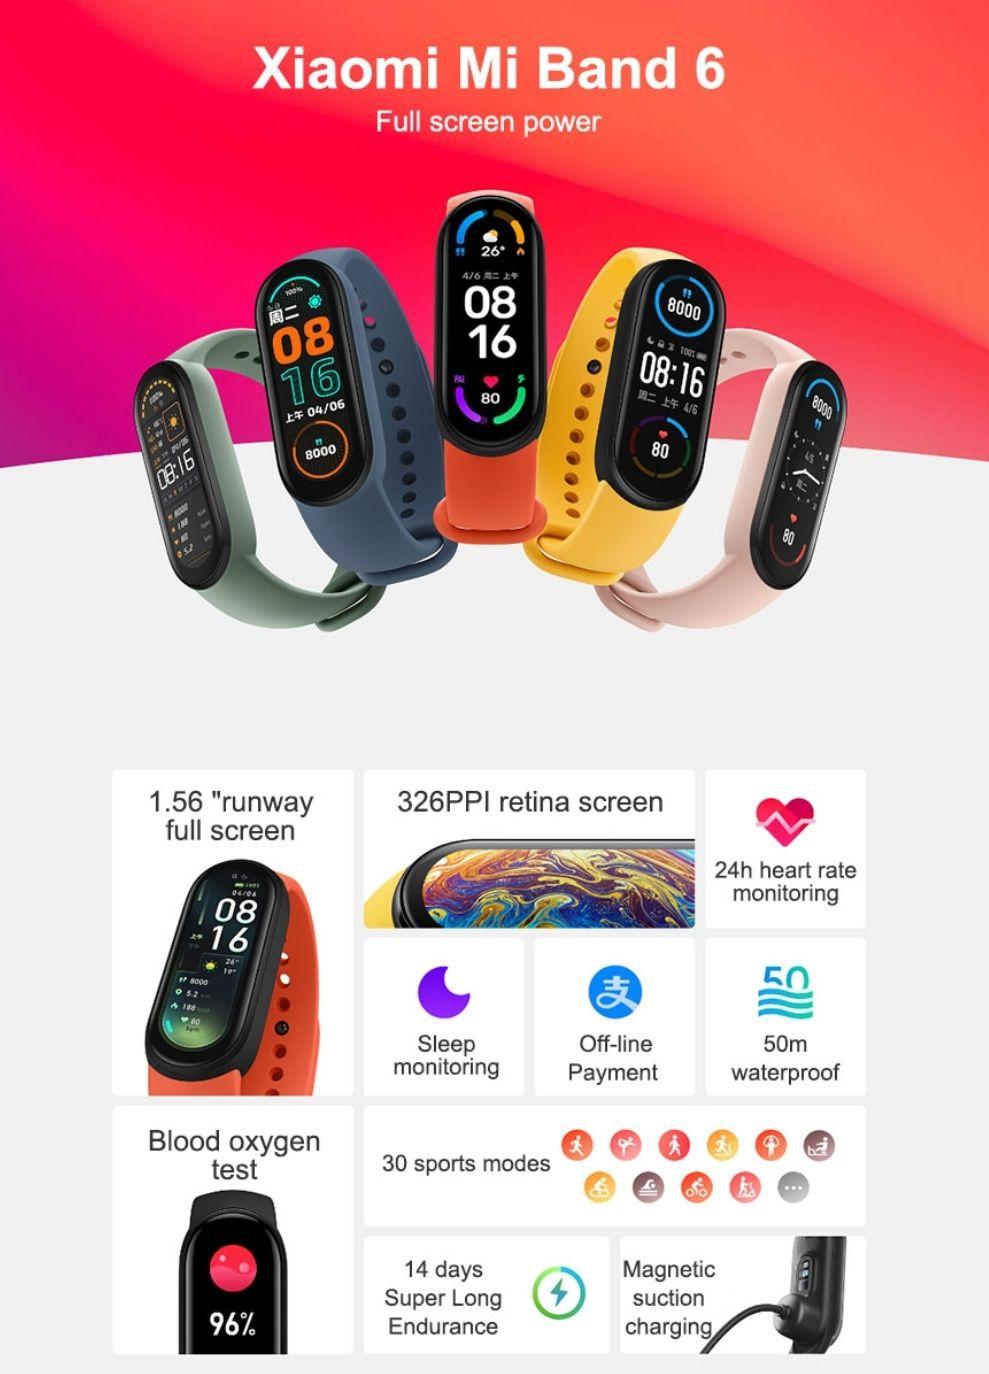 Xiaomi Mi Band 6 smart watch 5atm